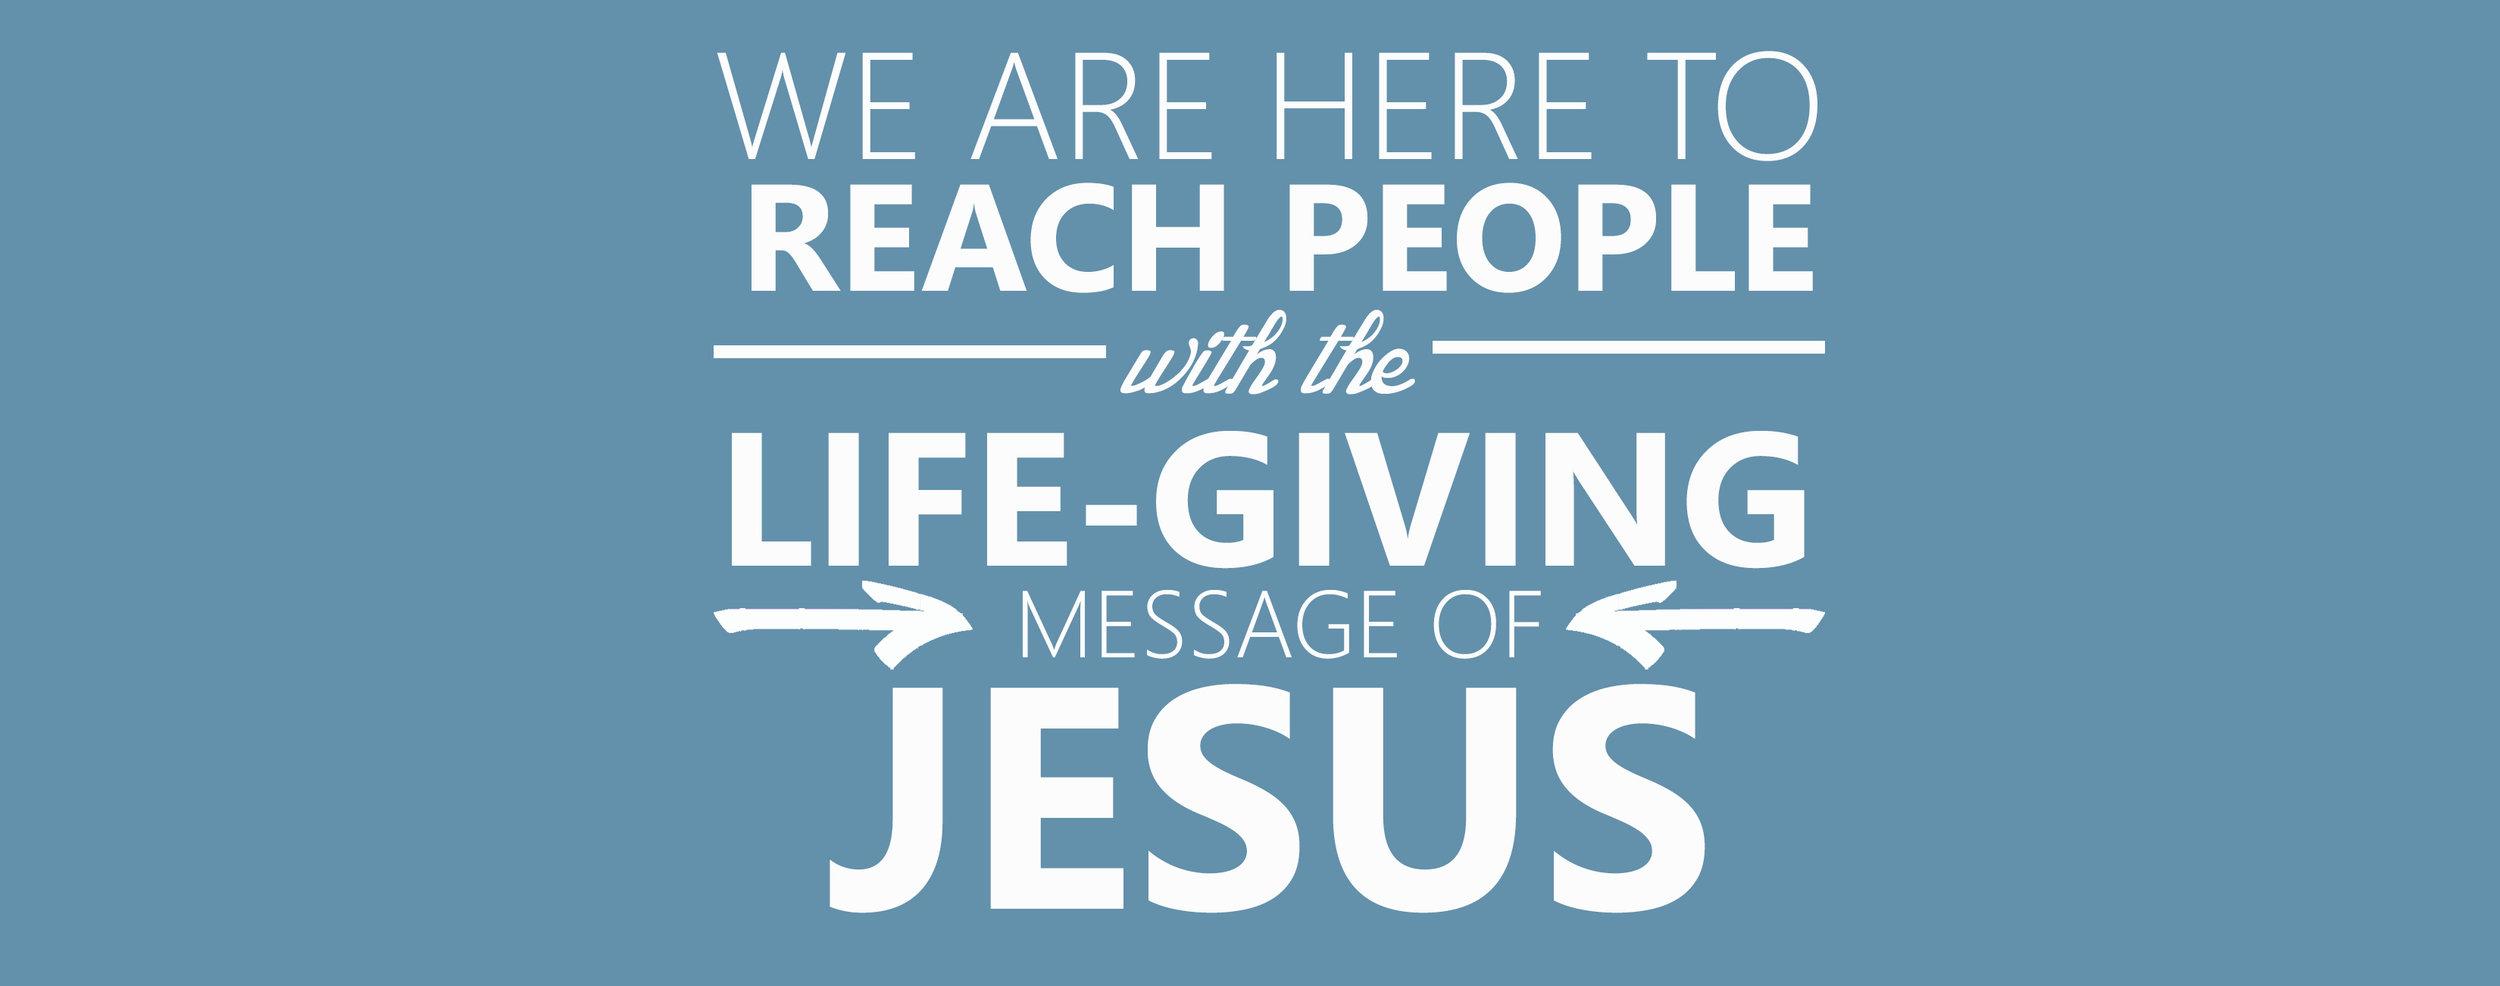 Mission Vision New Life Christian Church Non-Denominational Non denominational Fernando Cabrera Family Bronx Church Bronx, New York